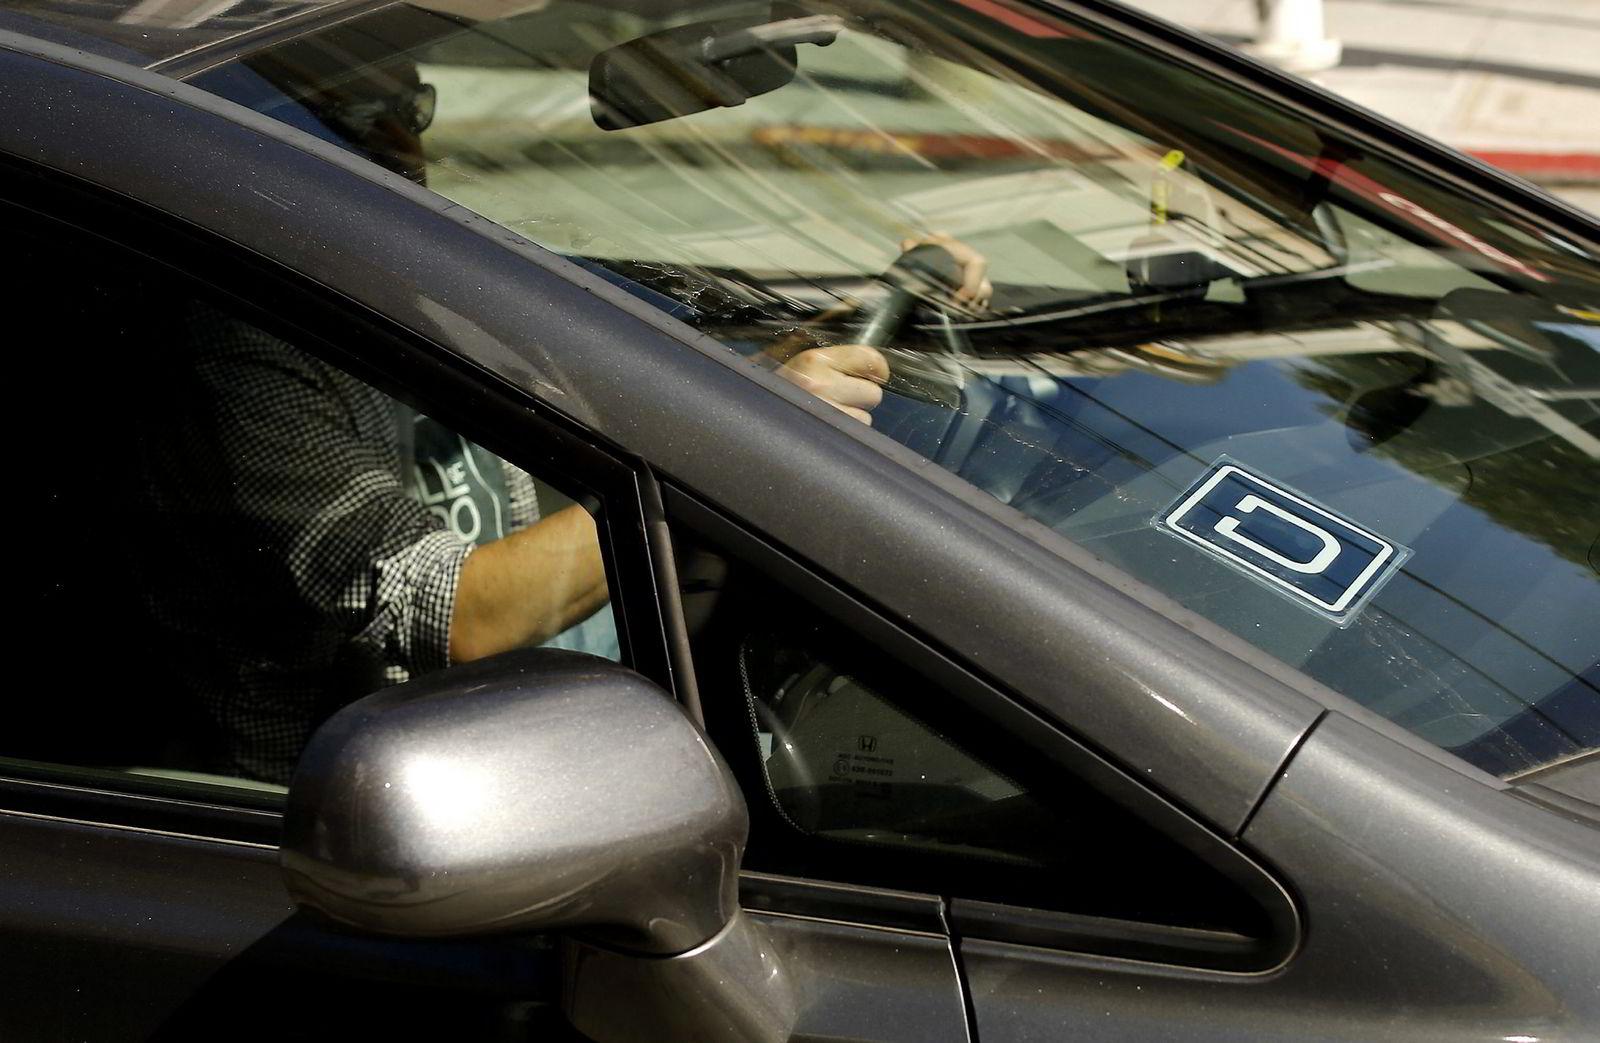 Over 60 Uber-sjåfører er til nå avskiltet i Norge. Foto: Robert Galbraith/Reuters/NTB Scanpix